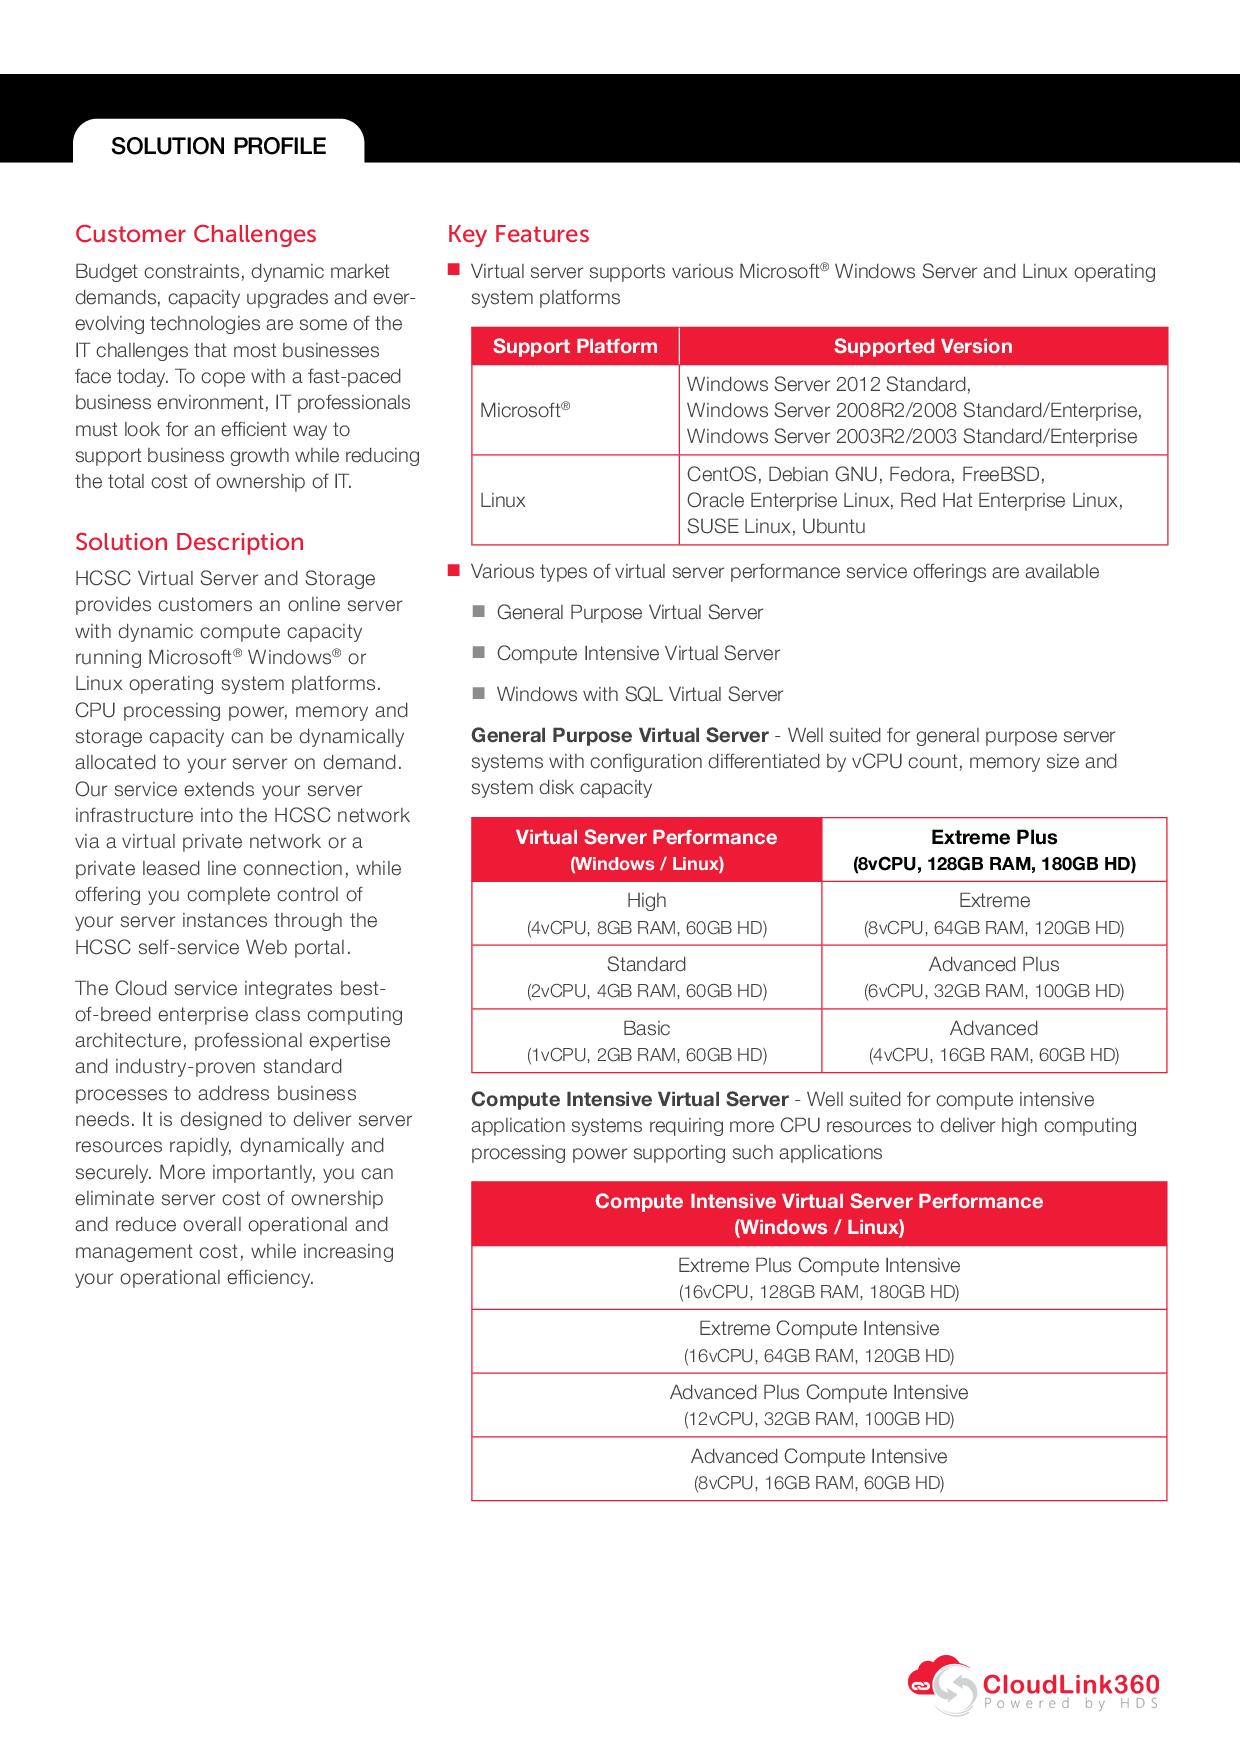 hcsc-vss-datasheet2